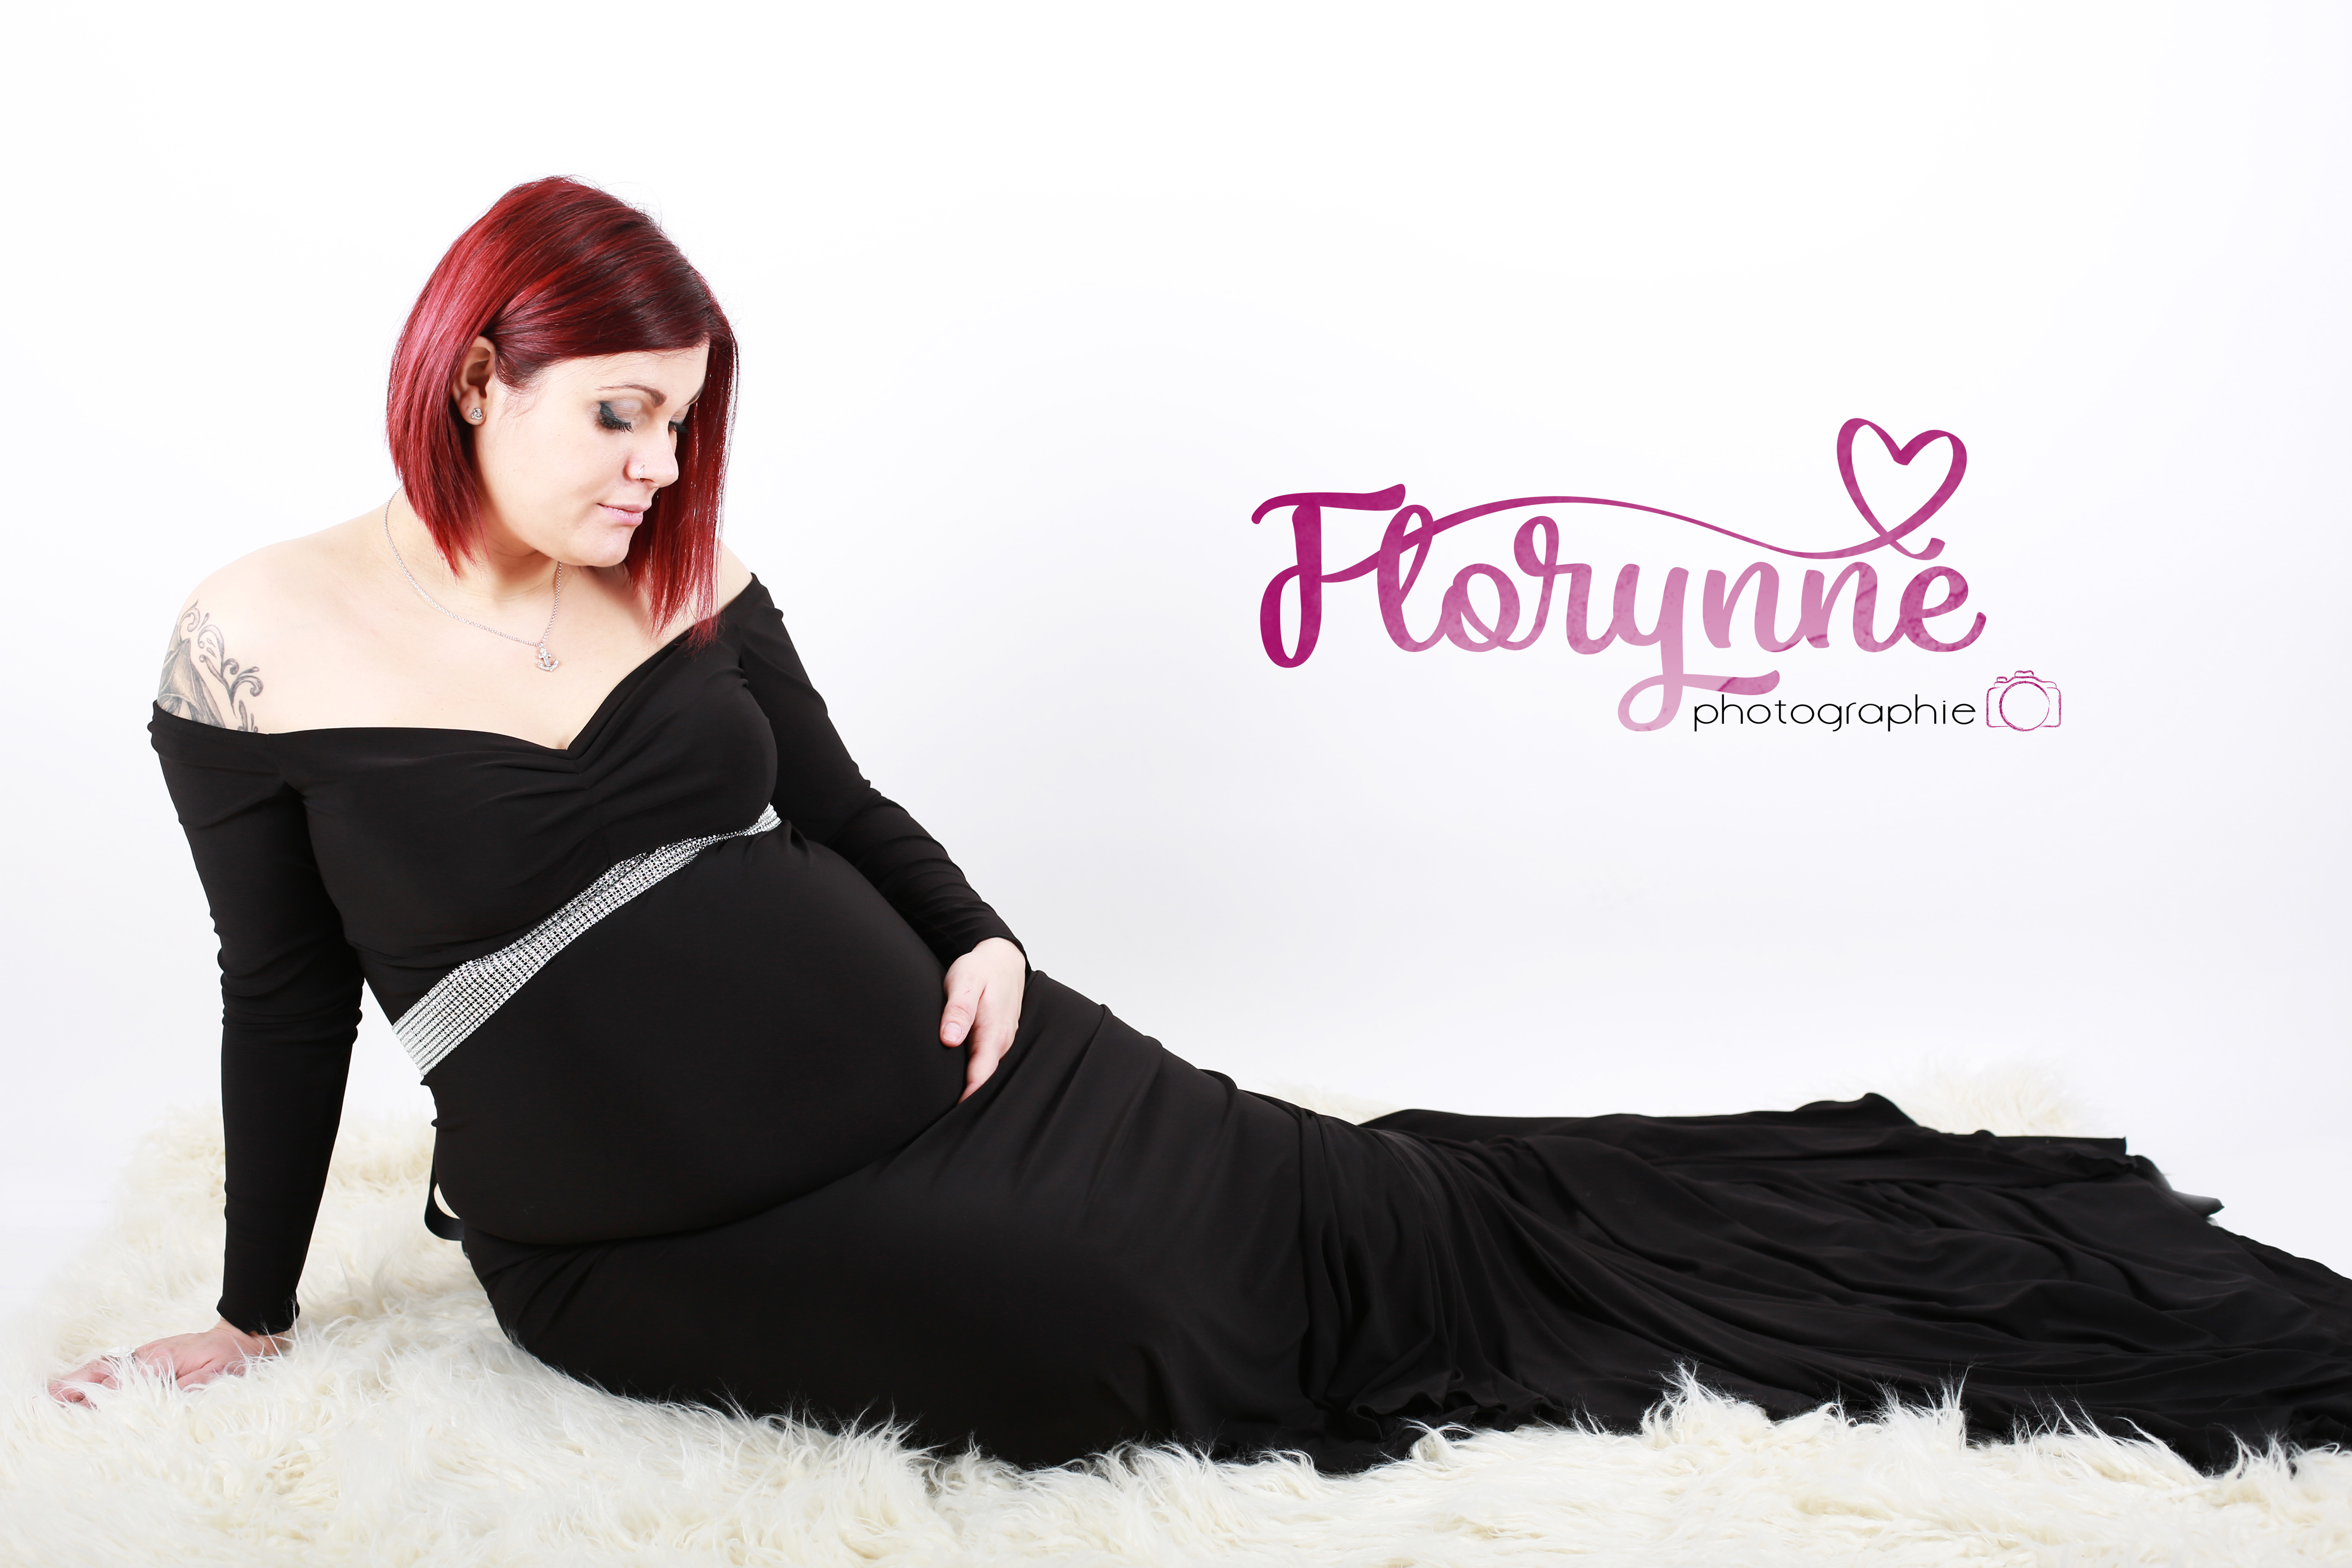 Florynne photographie - Grossesse 76